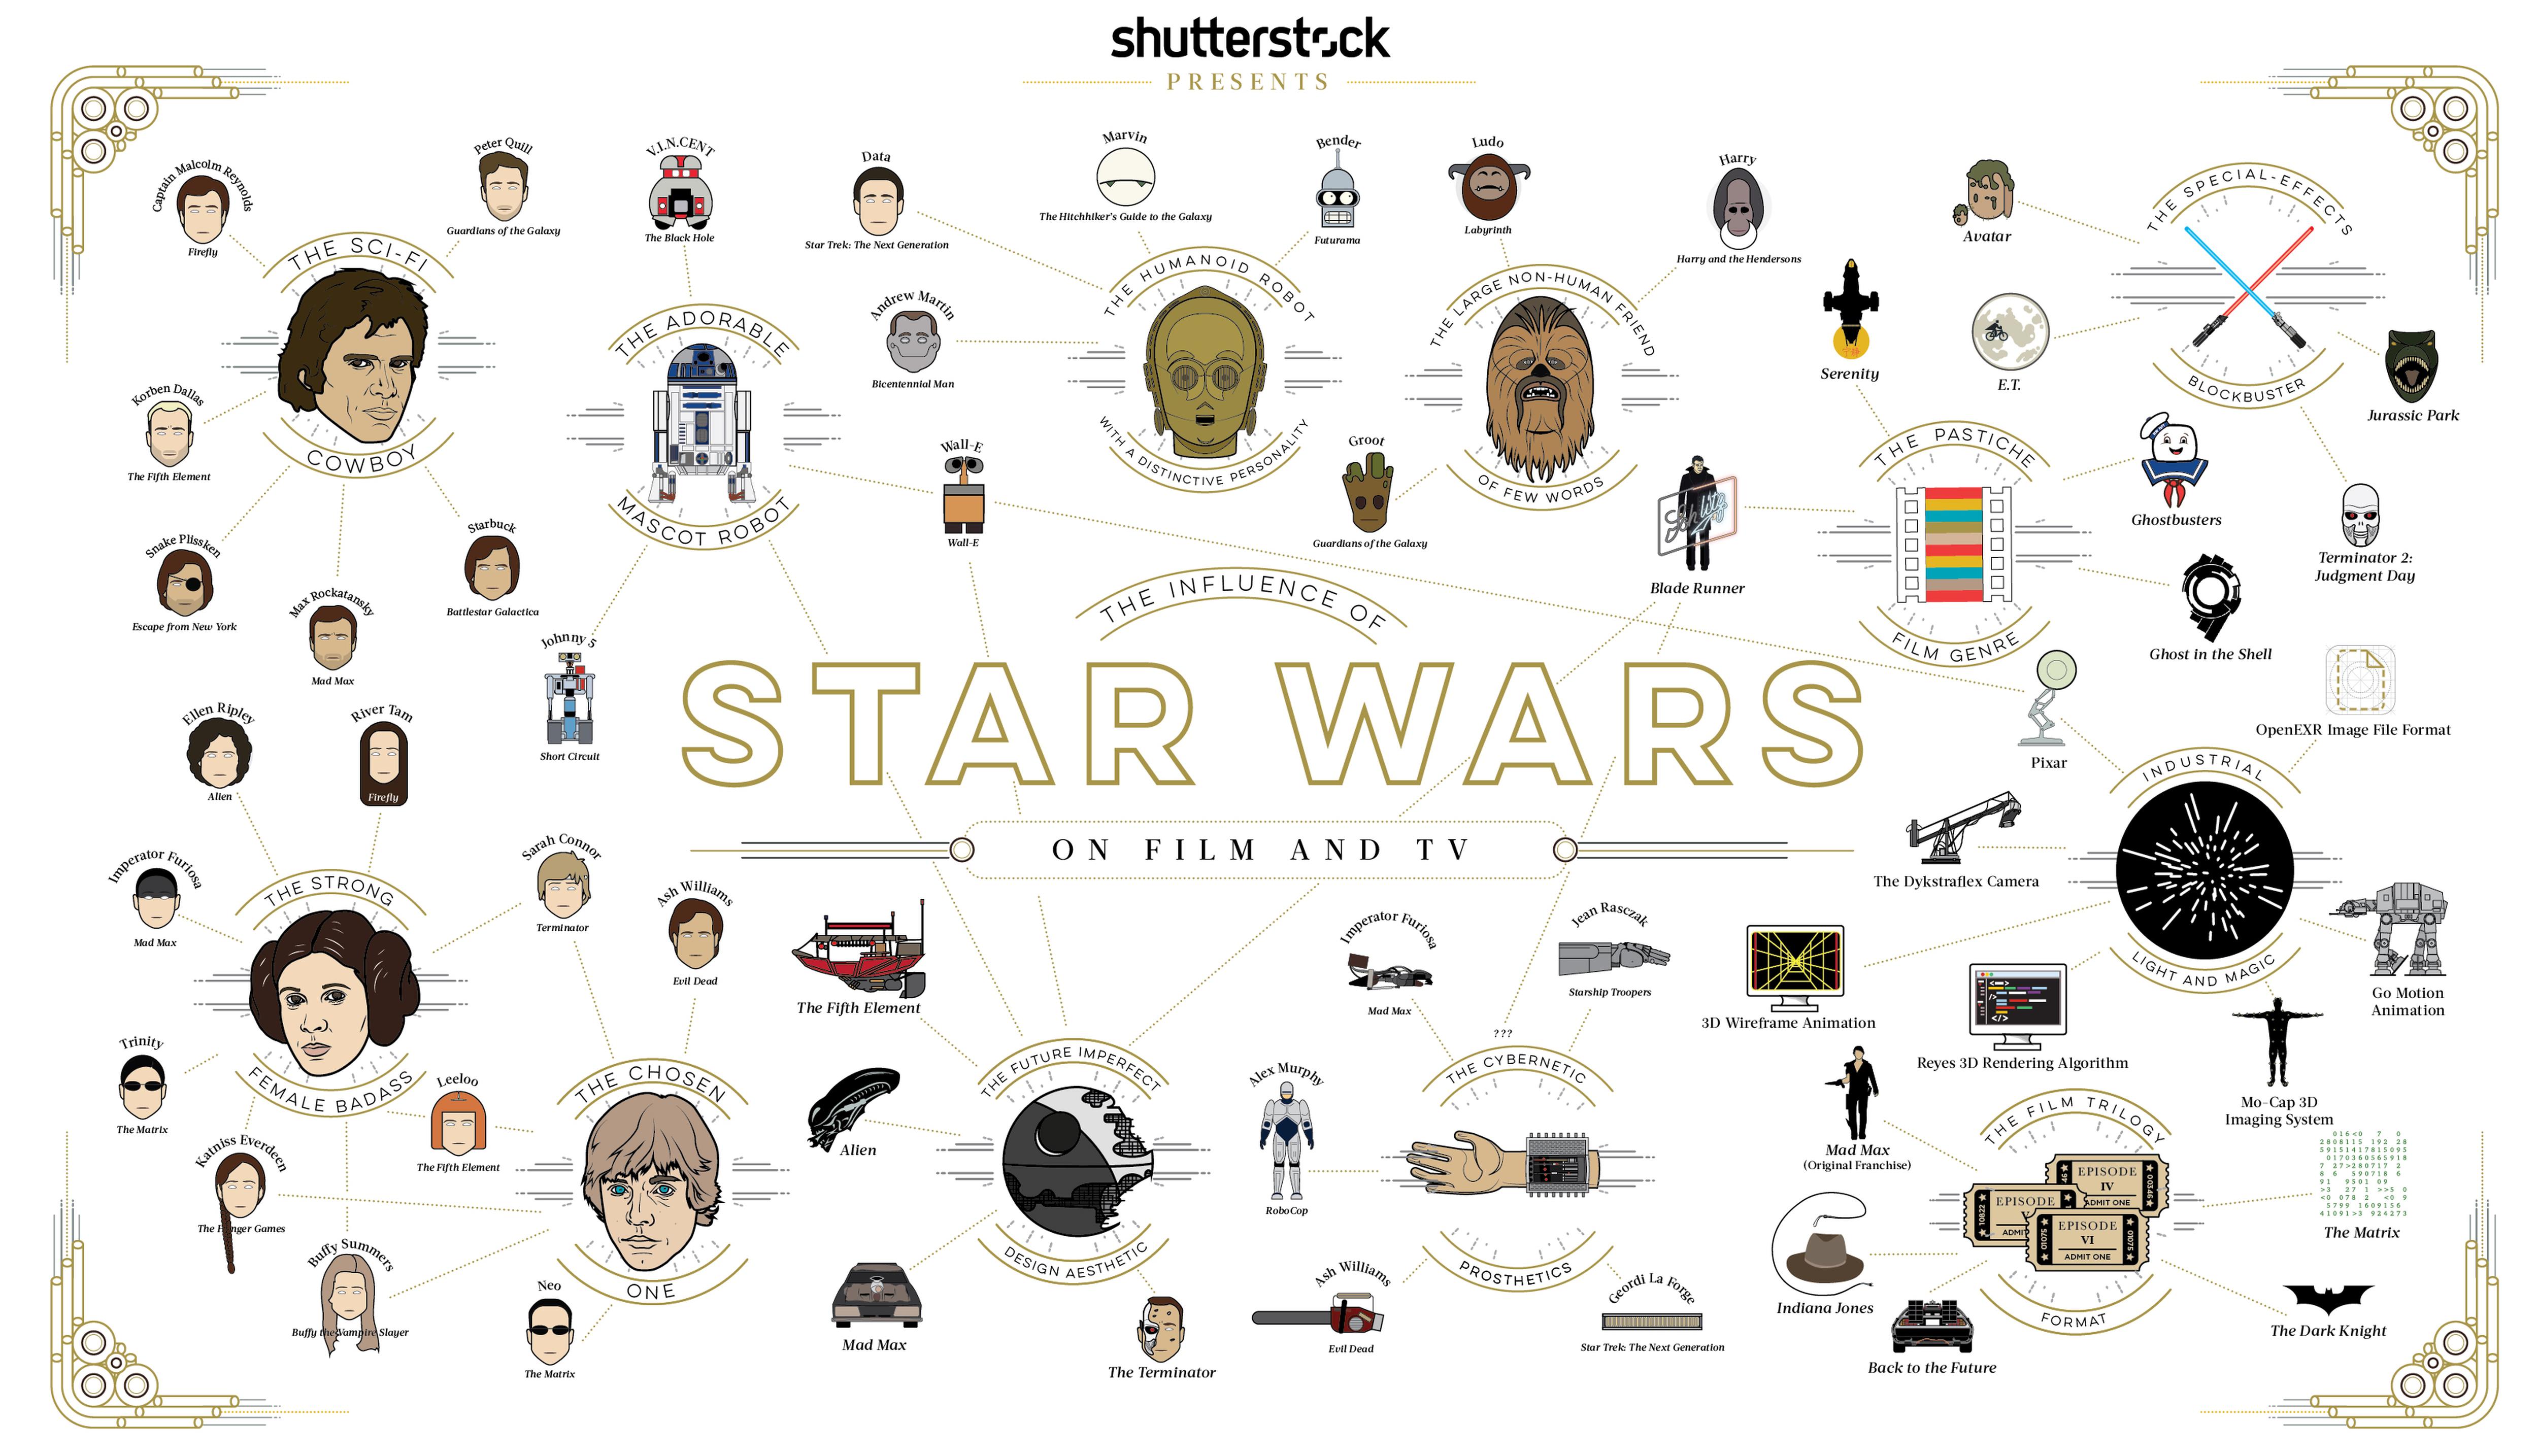 Star Wars influence